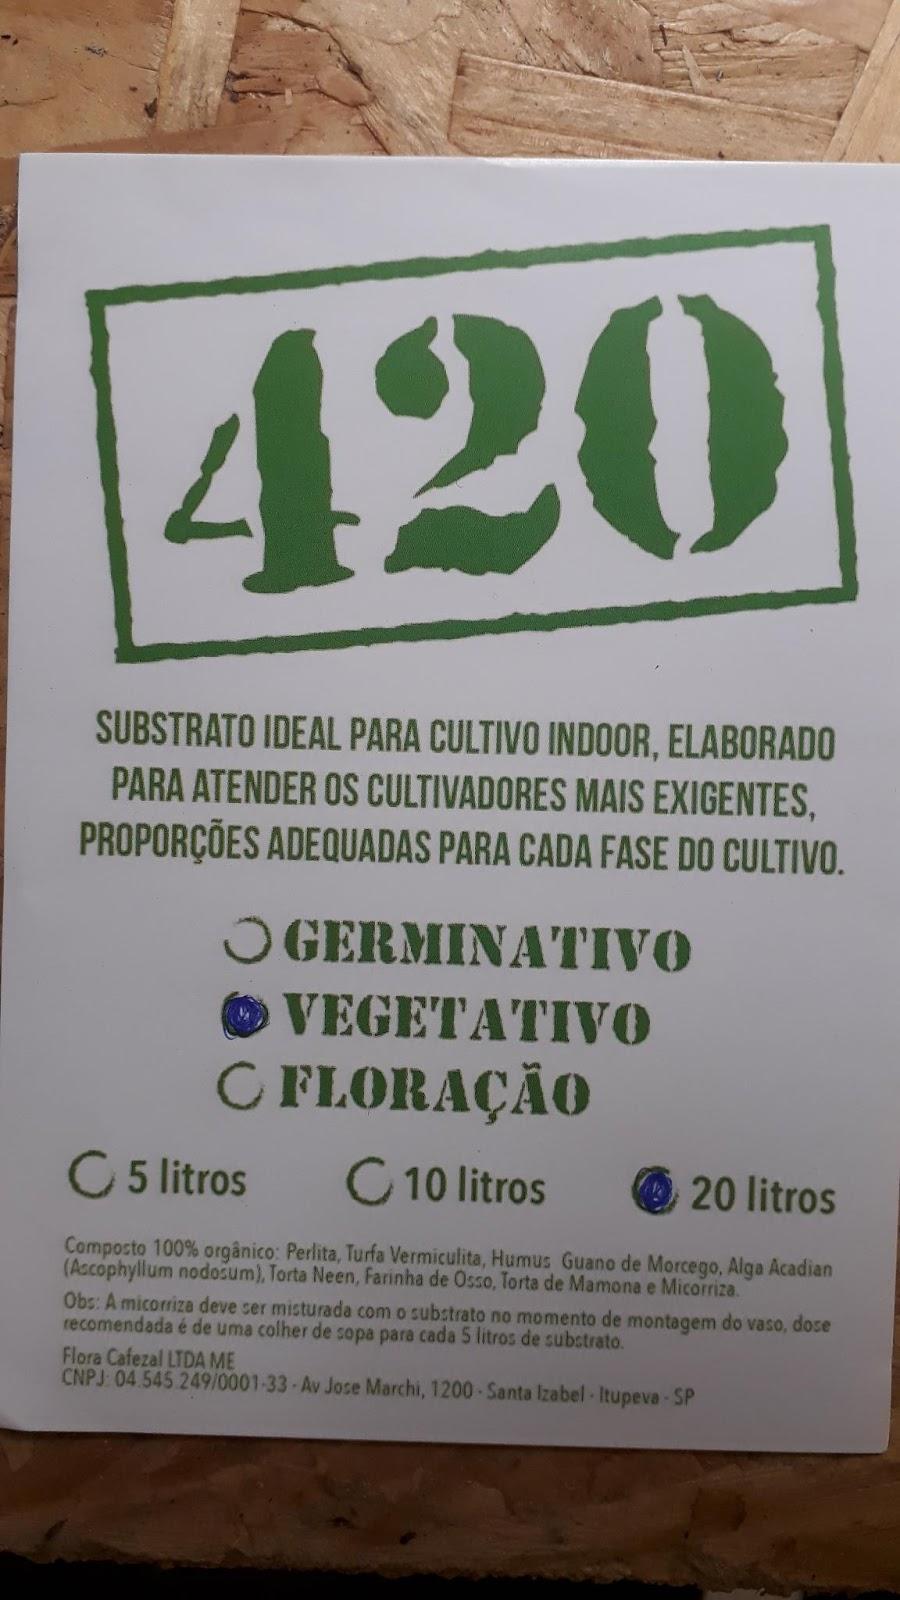 0c56fbed3e2f https   produto.mercadolivre .com.br MLB-874868548-super-solo-vegetativo-20-litros- JM